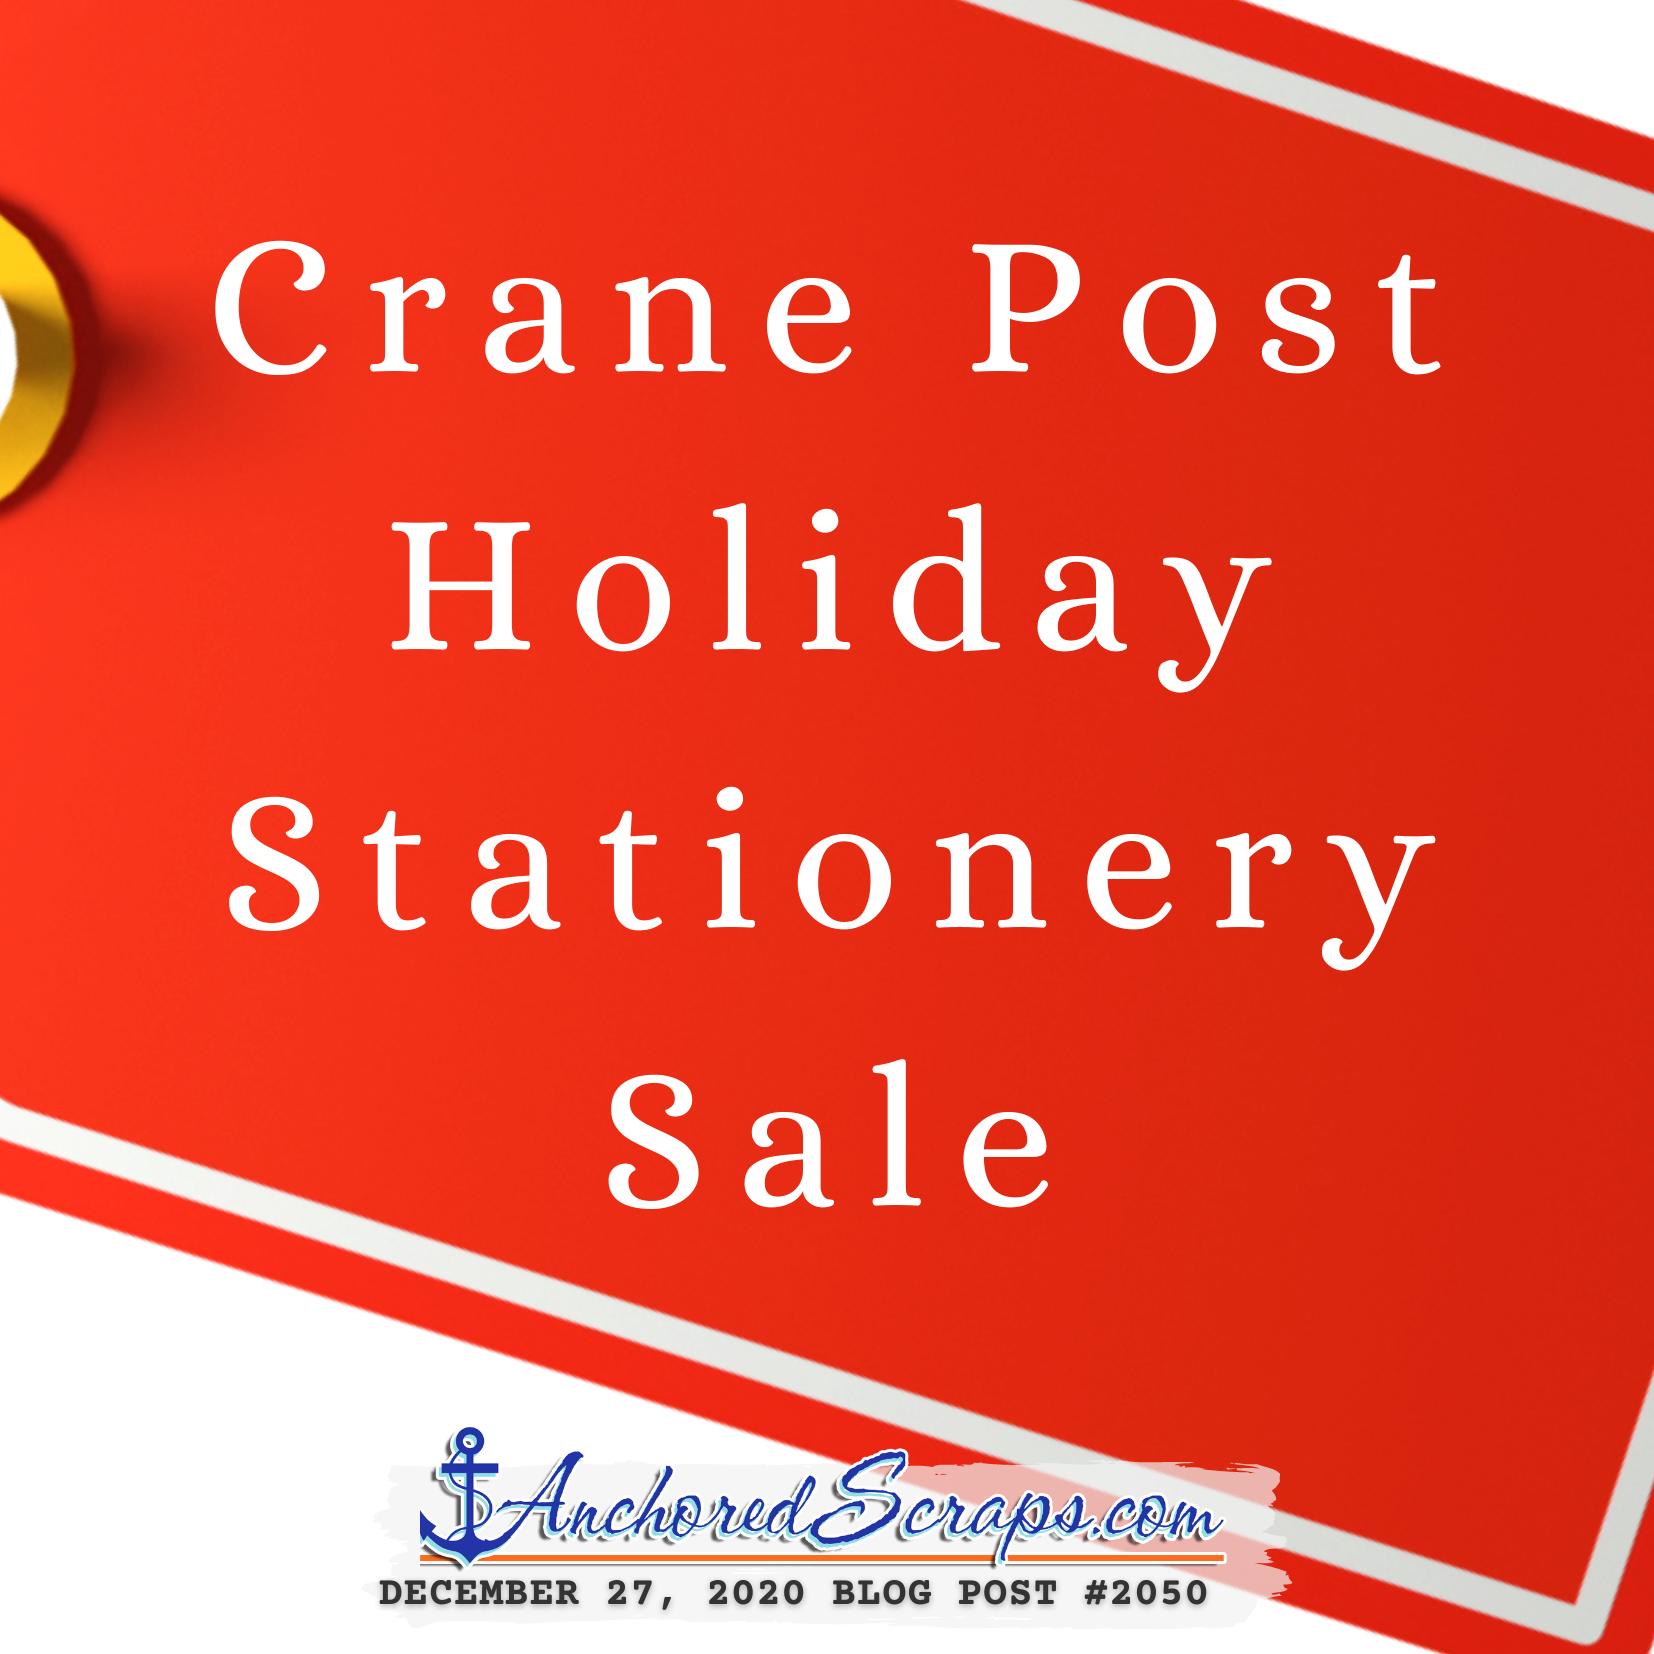 Crane Post Holiday Stationery Sale #2050